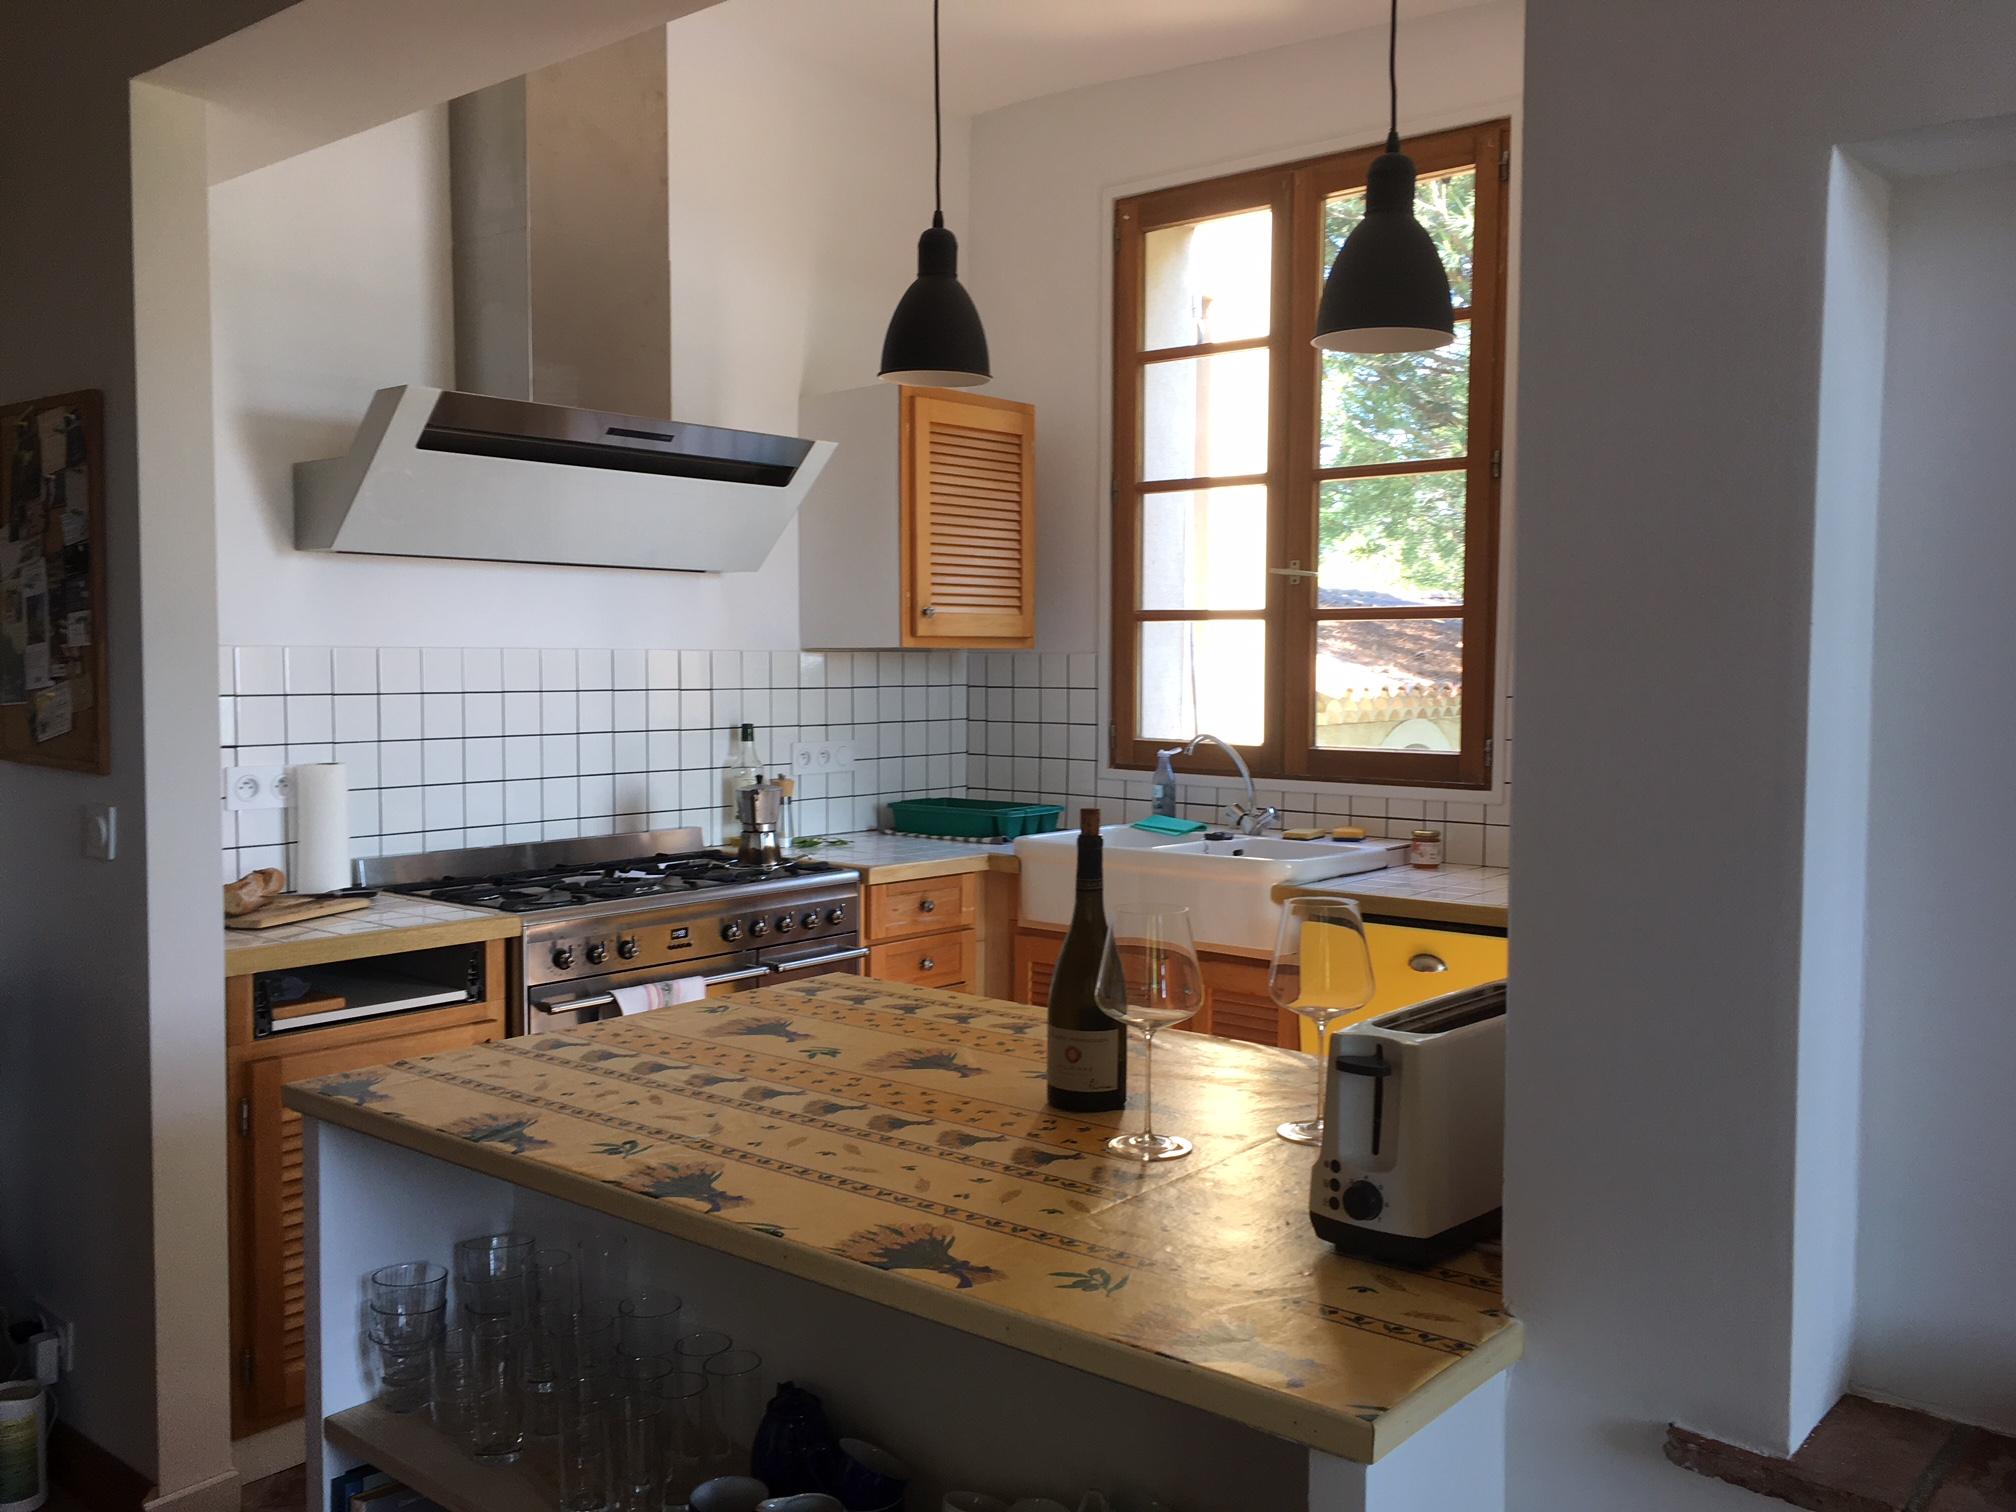 cuisine interieur